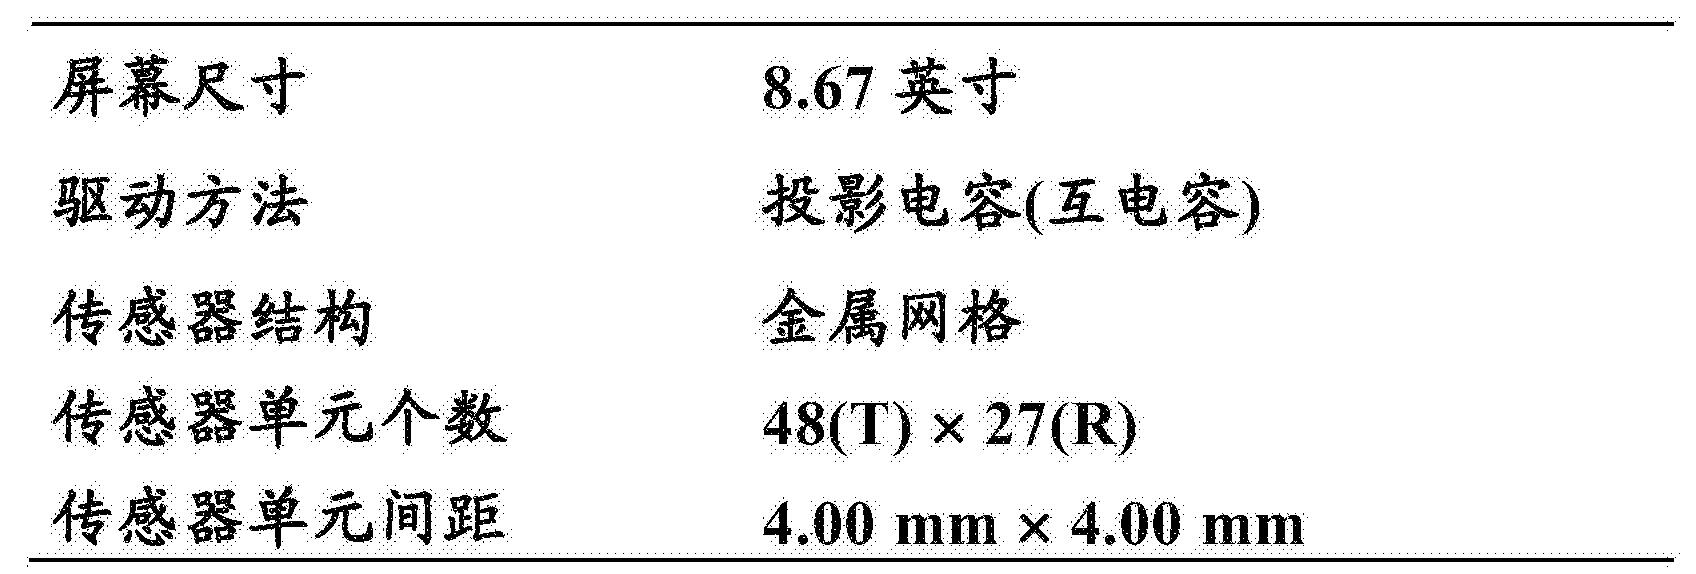 Figure CN105138195AD00291